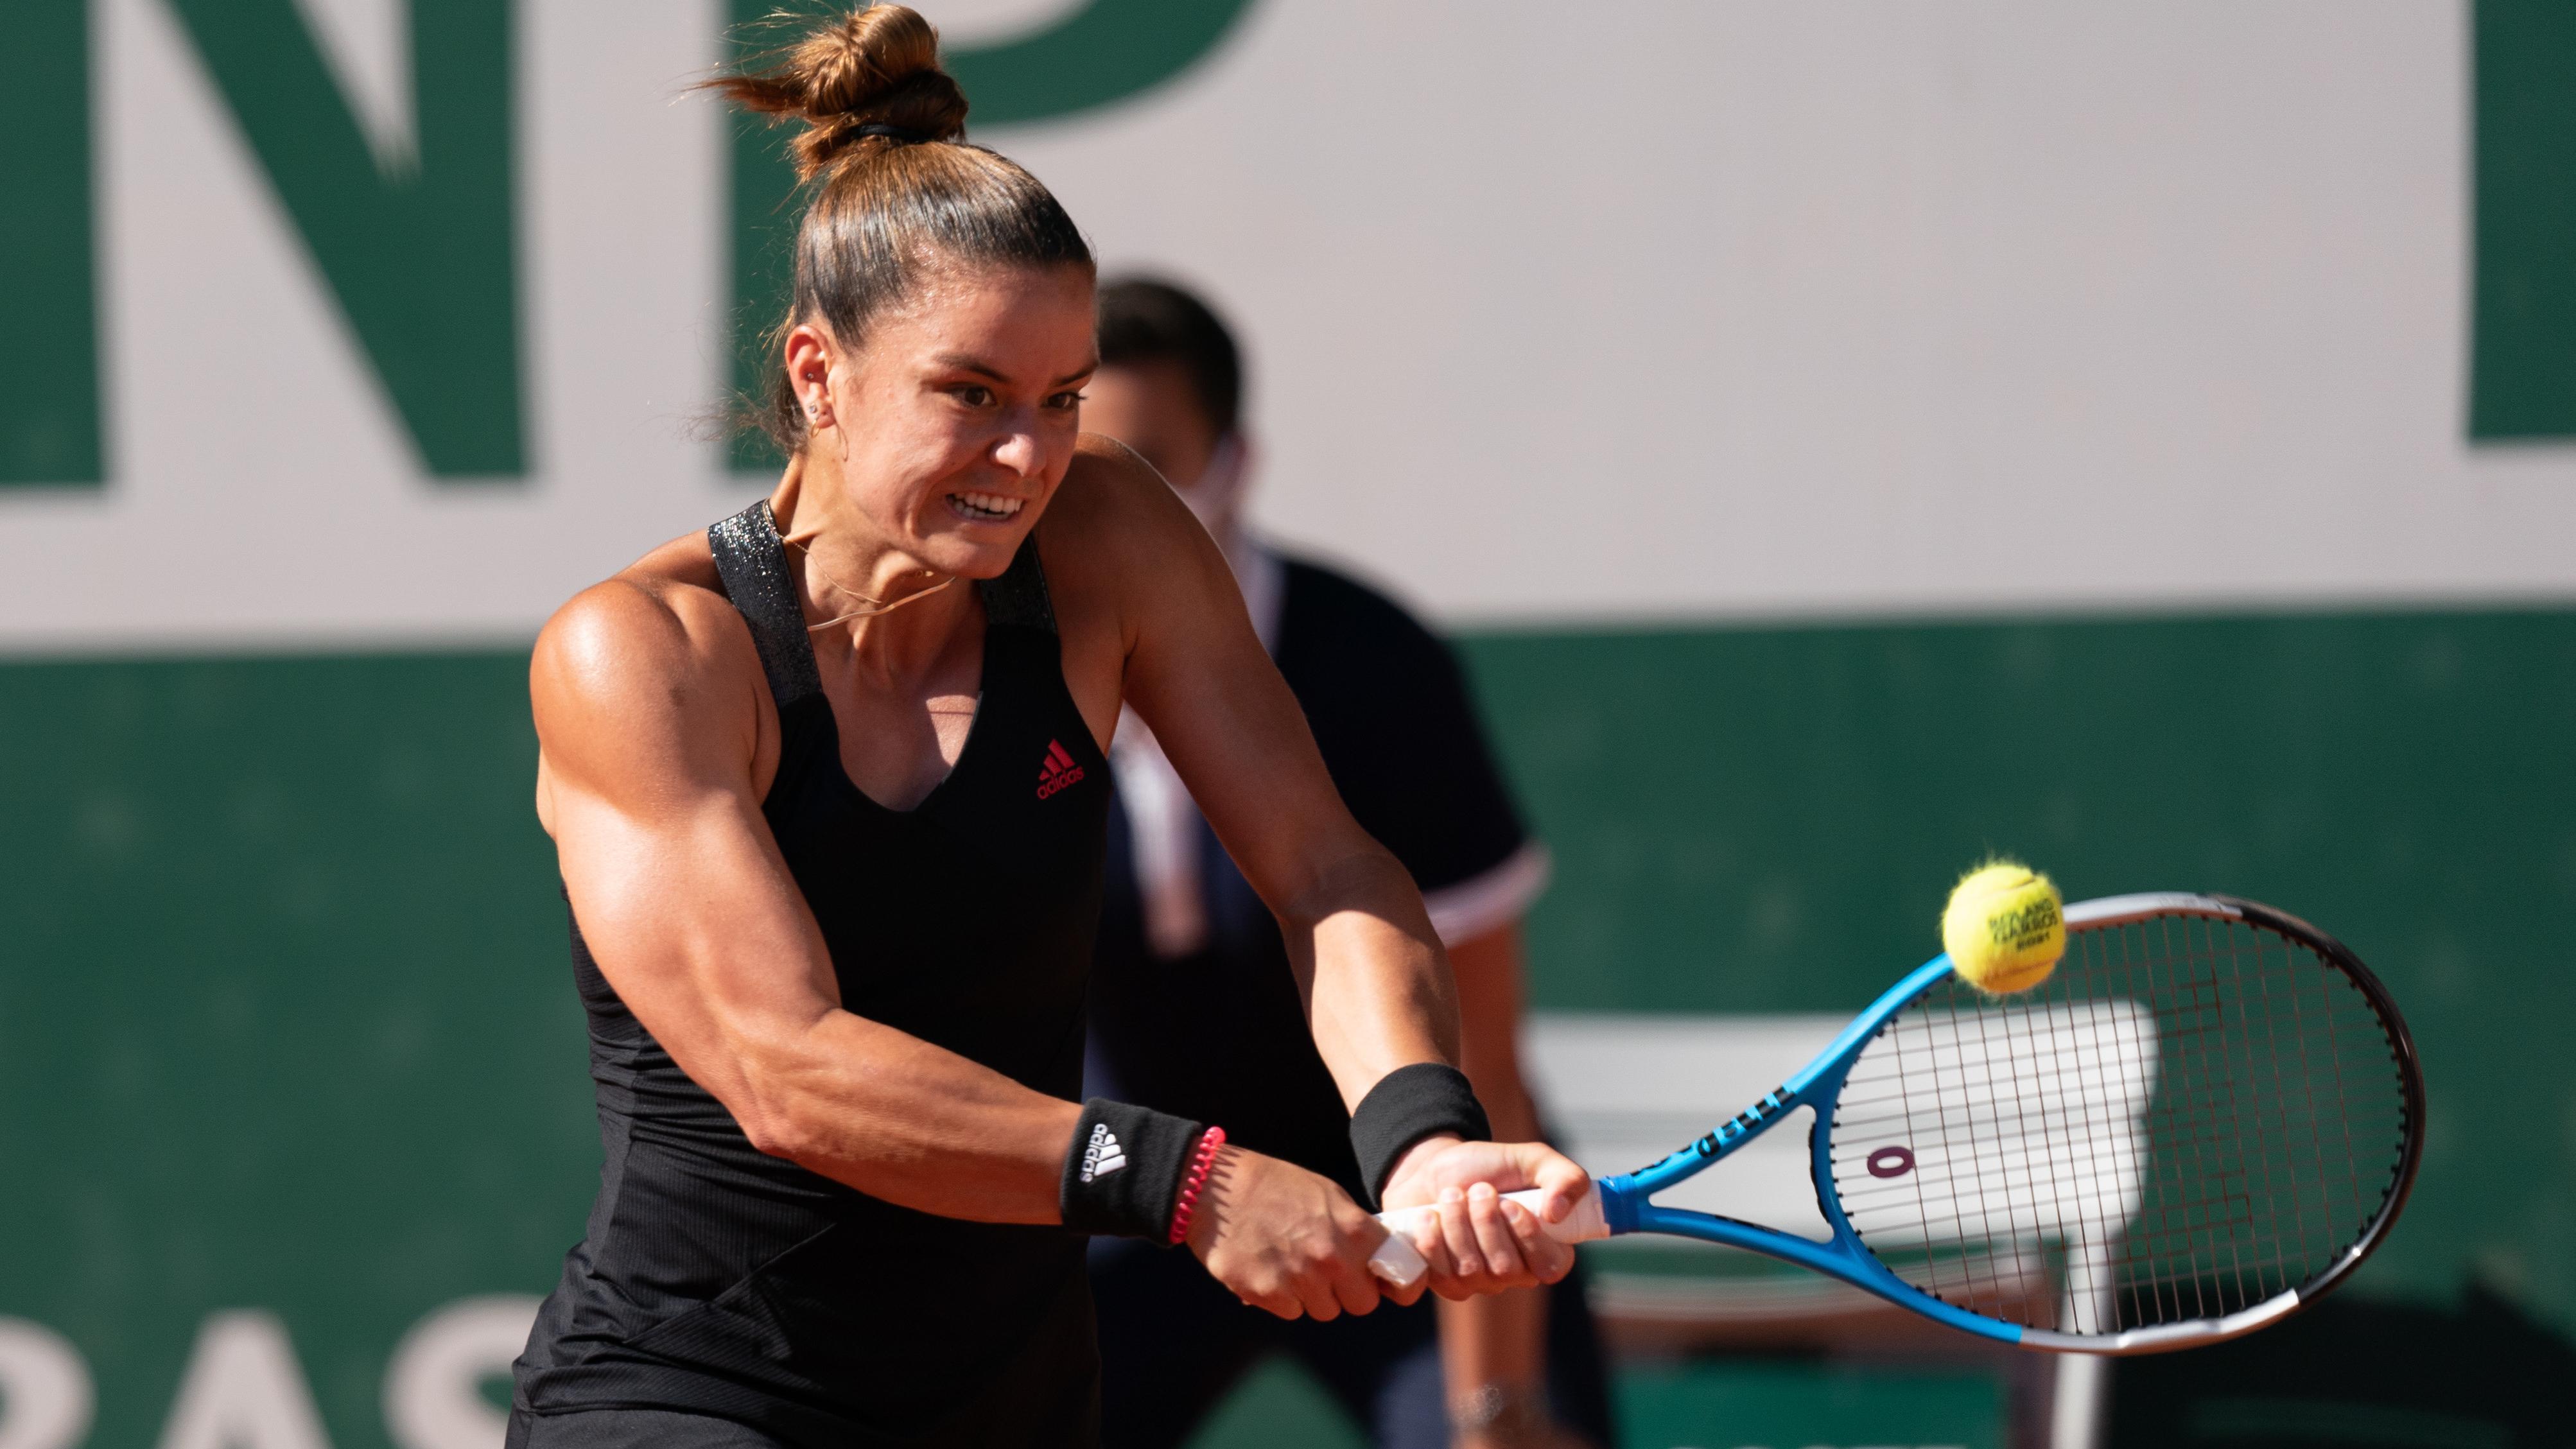 Wimbledon Championships 2021: Maria Sakkari vs. Arantxa Rus Tennis Pick and Prediction